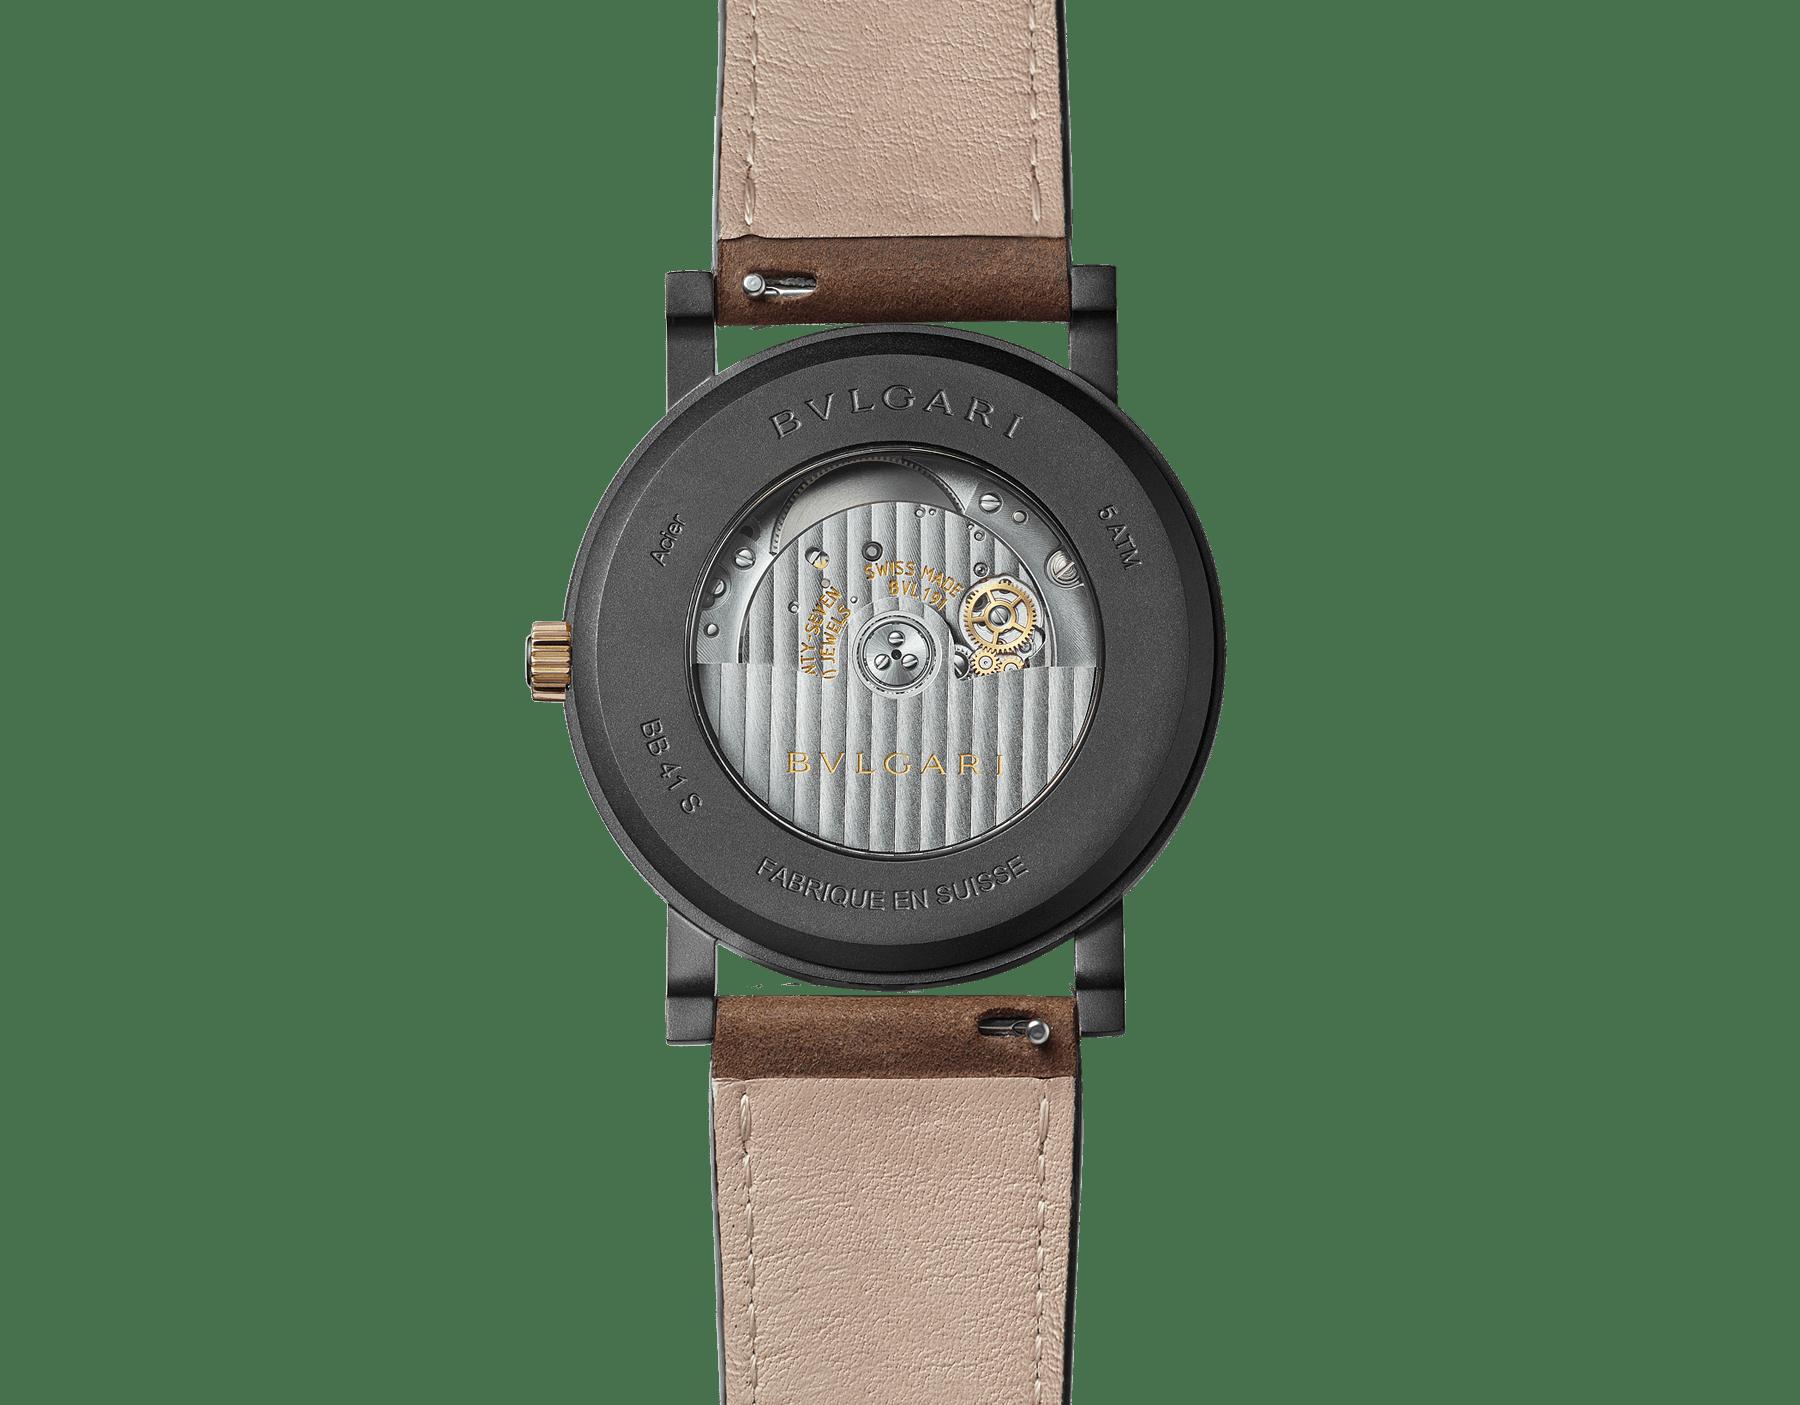 "BVLGARI BVLGARI都市特别版ROMA腕表,搭载品牌自制的自动上链机械机芯,精钢表壳经黑色DLC高耐磨处理,表圈镌刻""BVLGARI ROMA""字样,透明表背,黑色漆面粒面表盘,玫瑰金时标,棕色小牛皮表带和可替换的黑色橡胶表带。 103219 image 6"